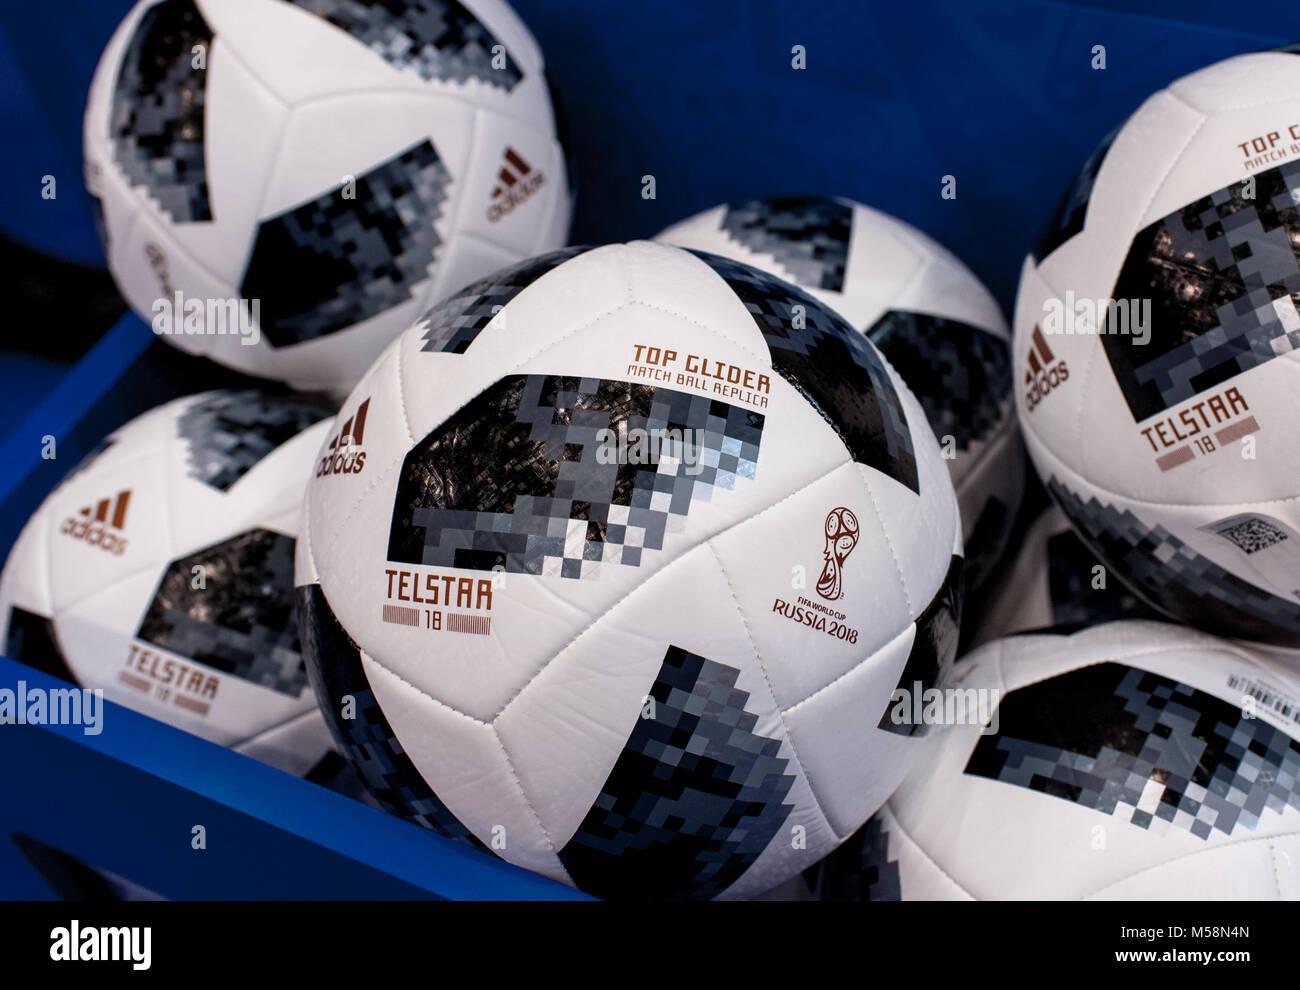 55ac6192da2ea Adidas Telstar 2018 Imágenes De Stock   Adidas Telstar 2018 Fotos De ...